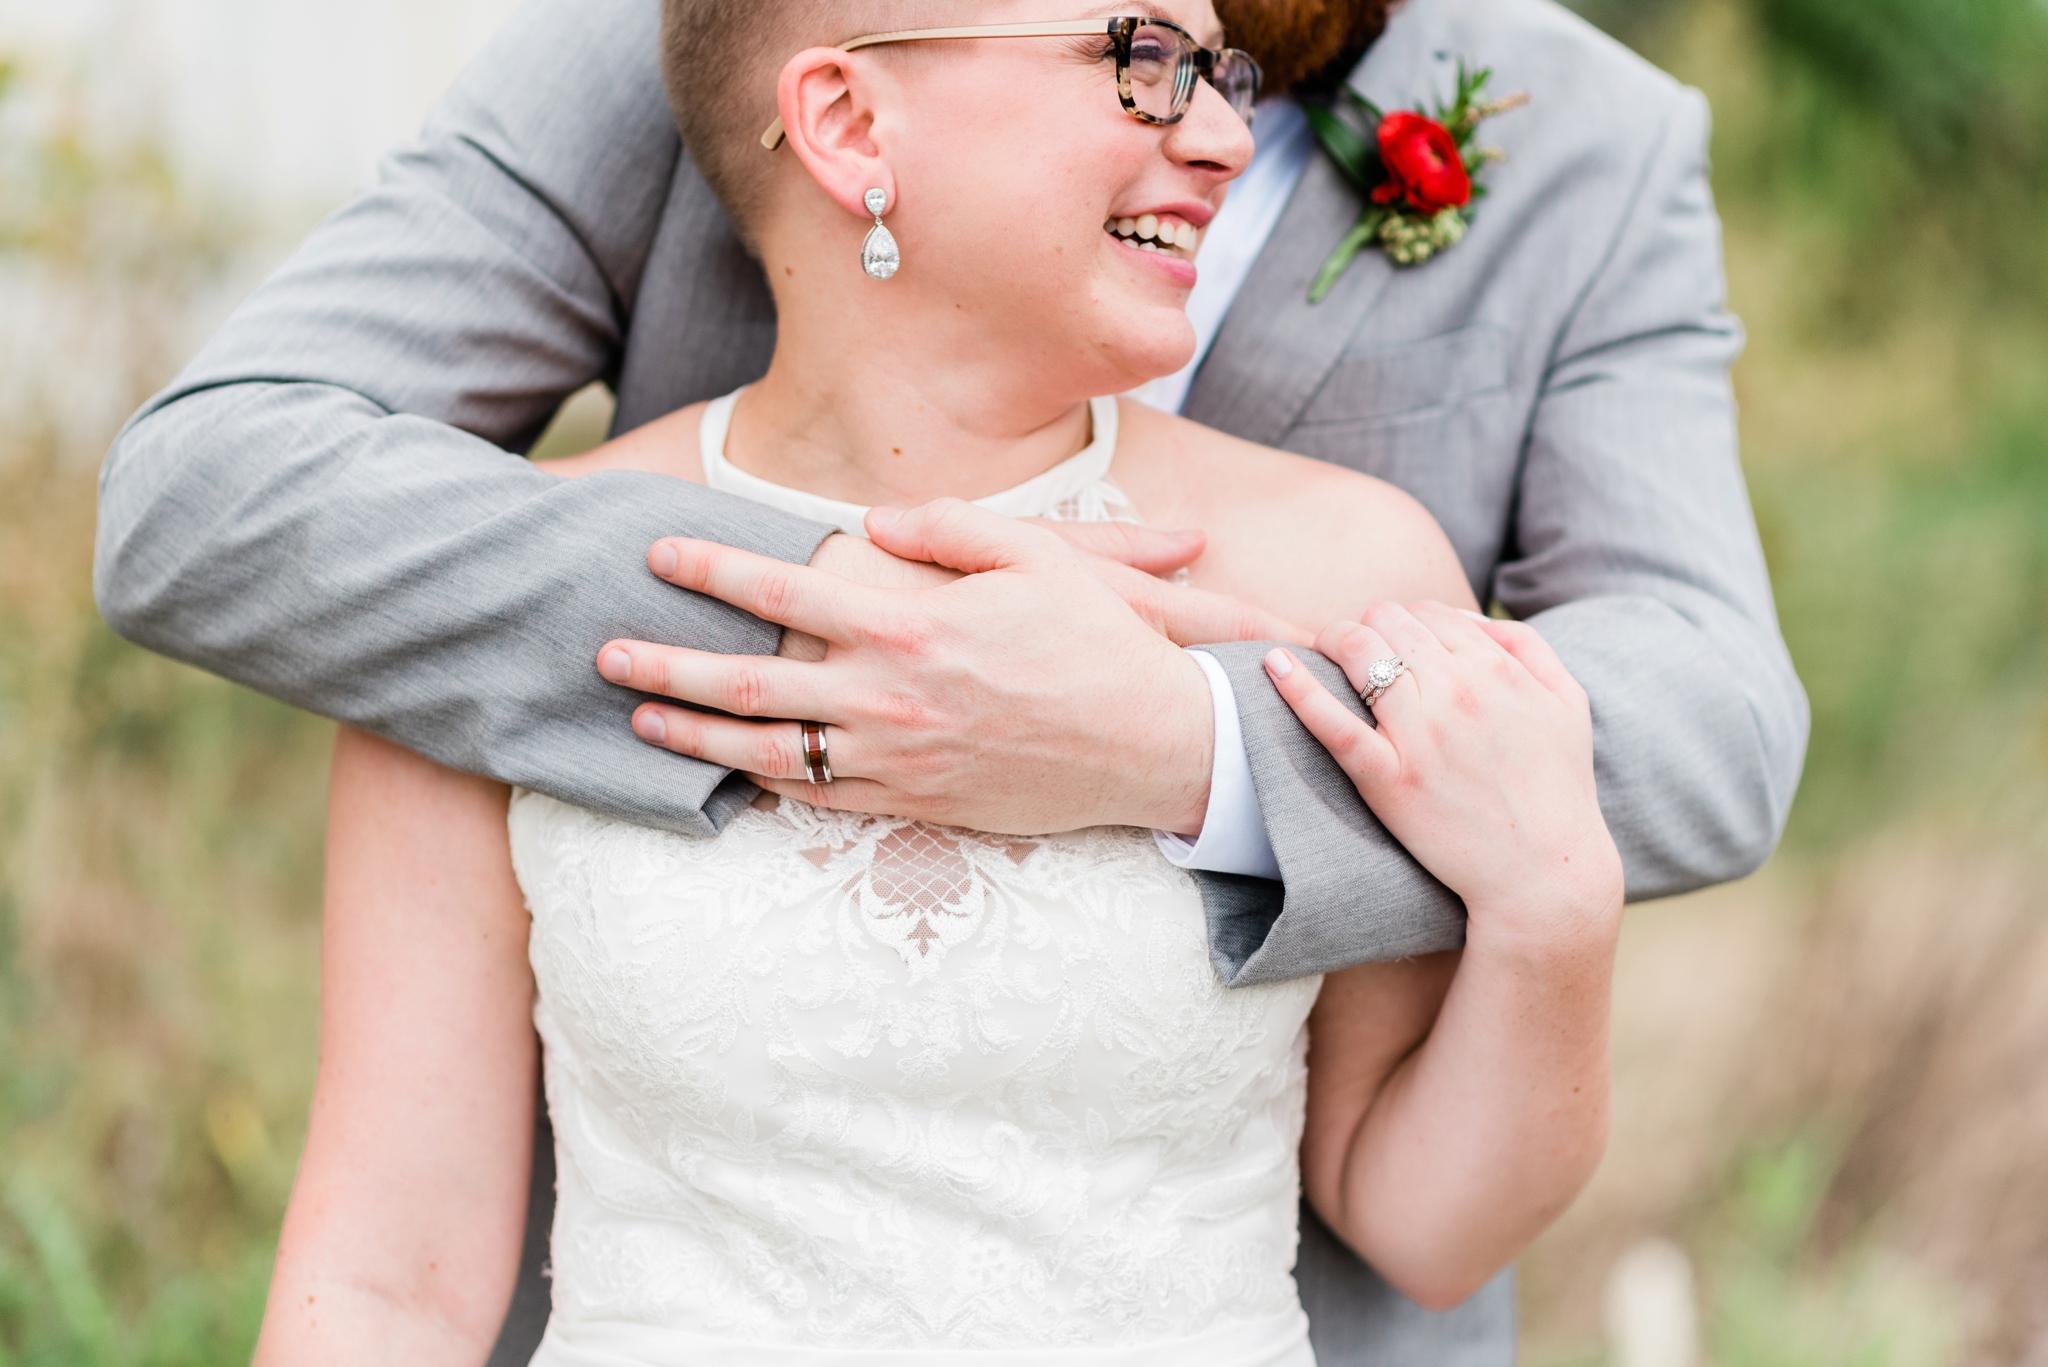 Emily Grace Photography, Lancaster PA Wedding Photographer, The Booking House Wedding Venue, Manheim PA Wedding Venue, The Booking House Manheim Couples Photos, Central PA Wedding Photographer